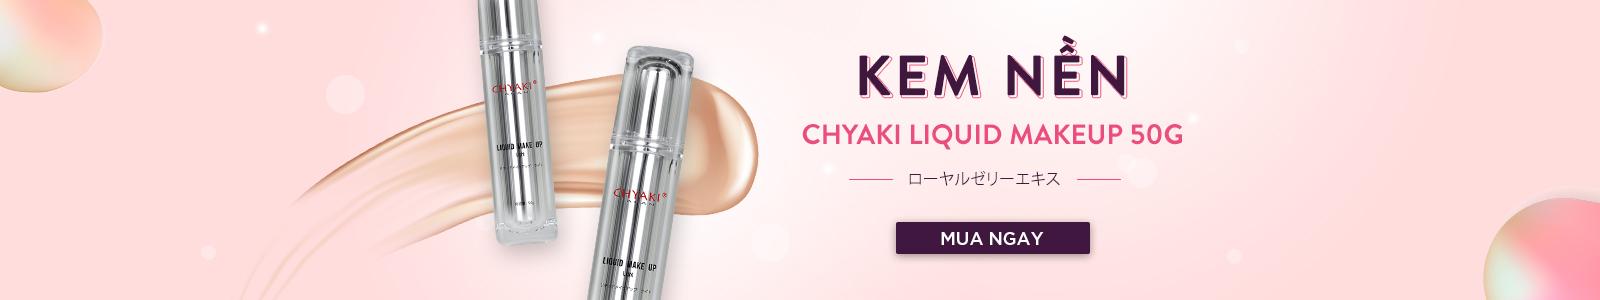 Kem nền Chyaki Liquid Makeup 50g